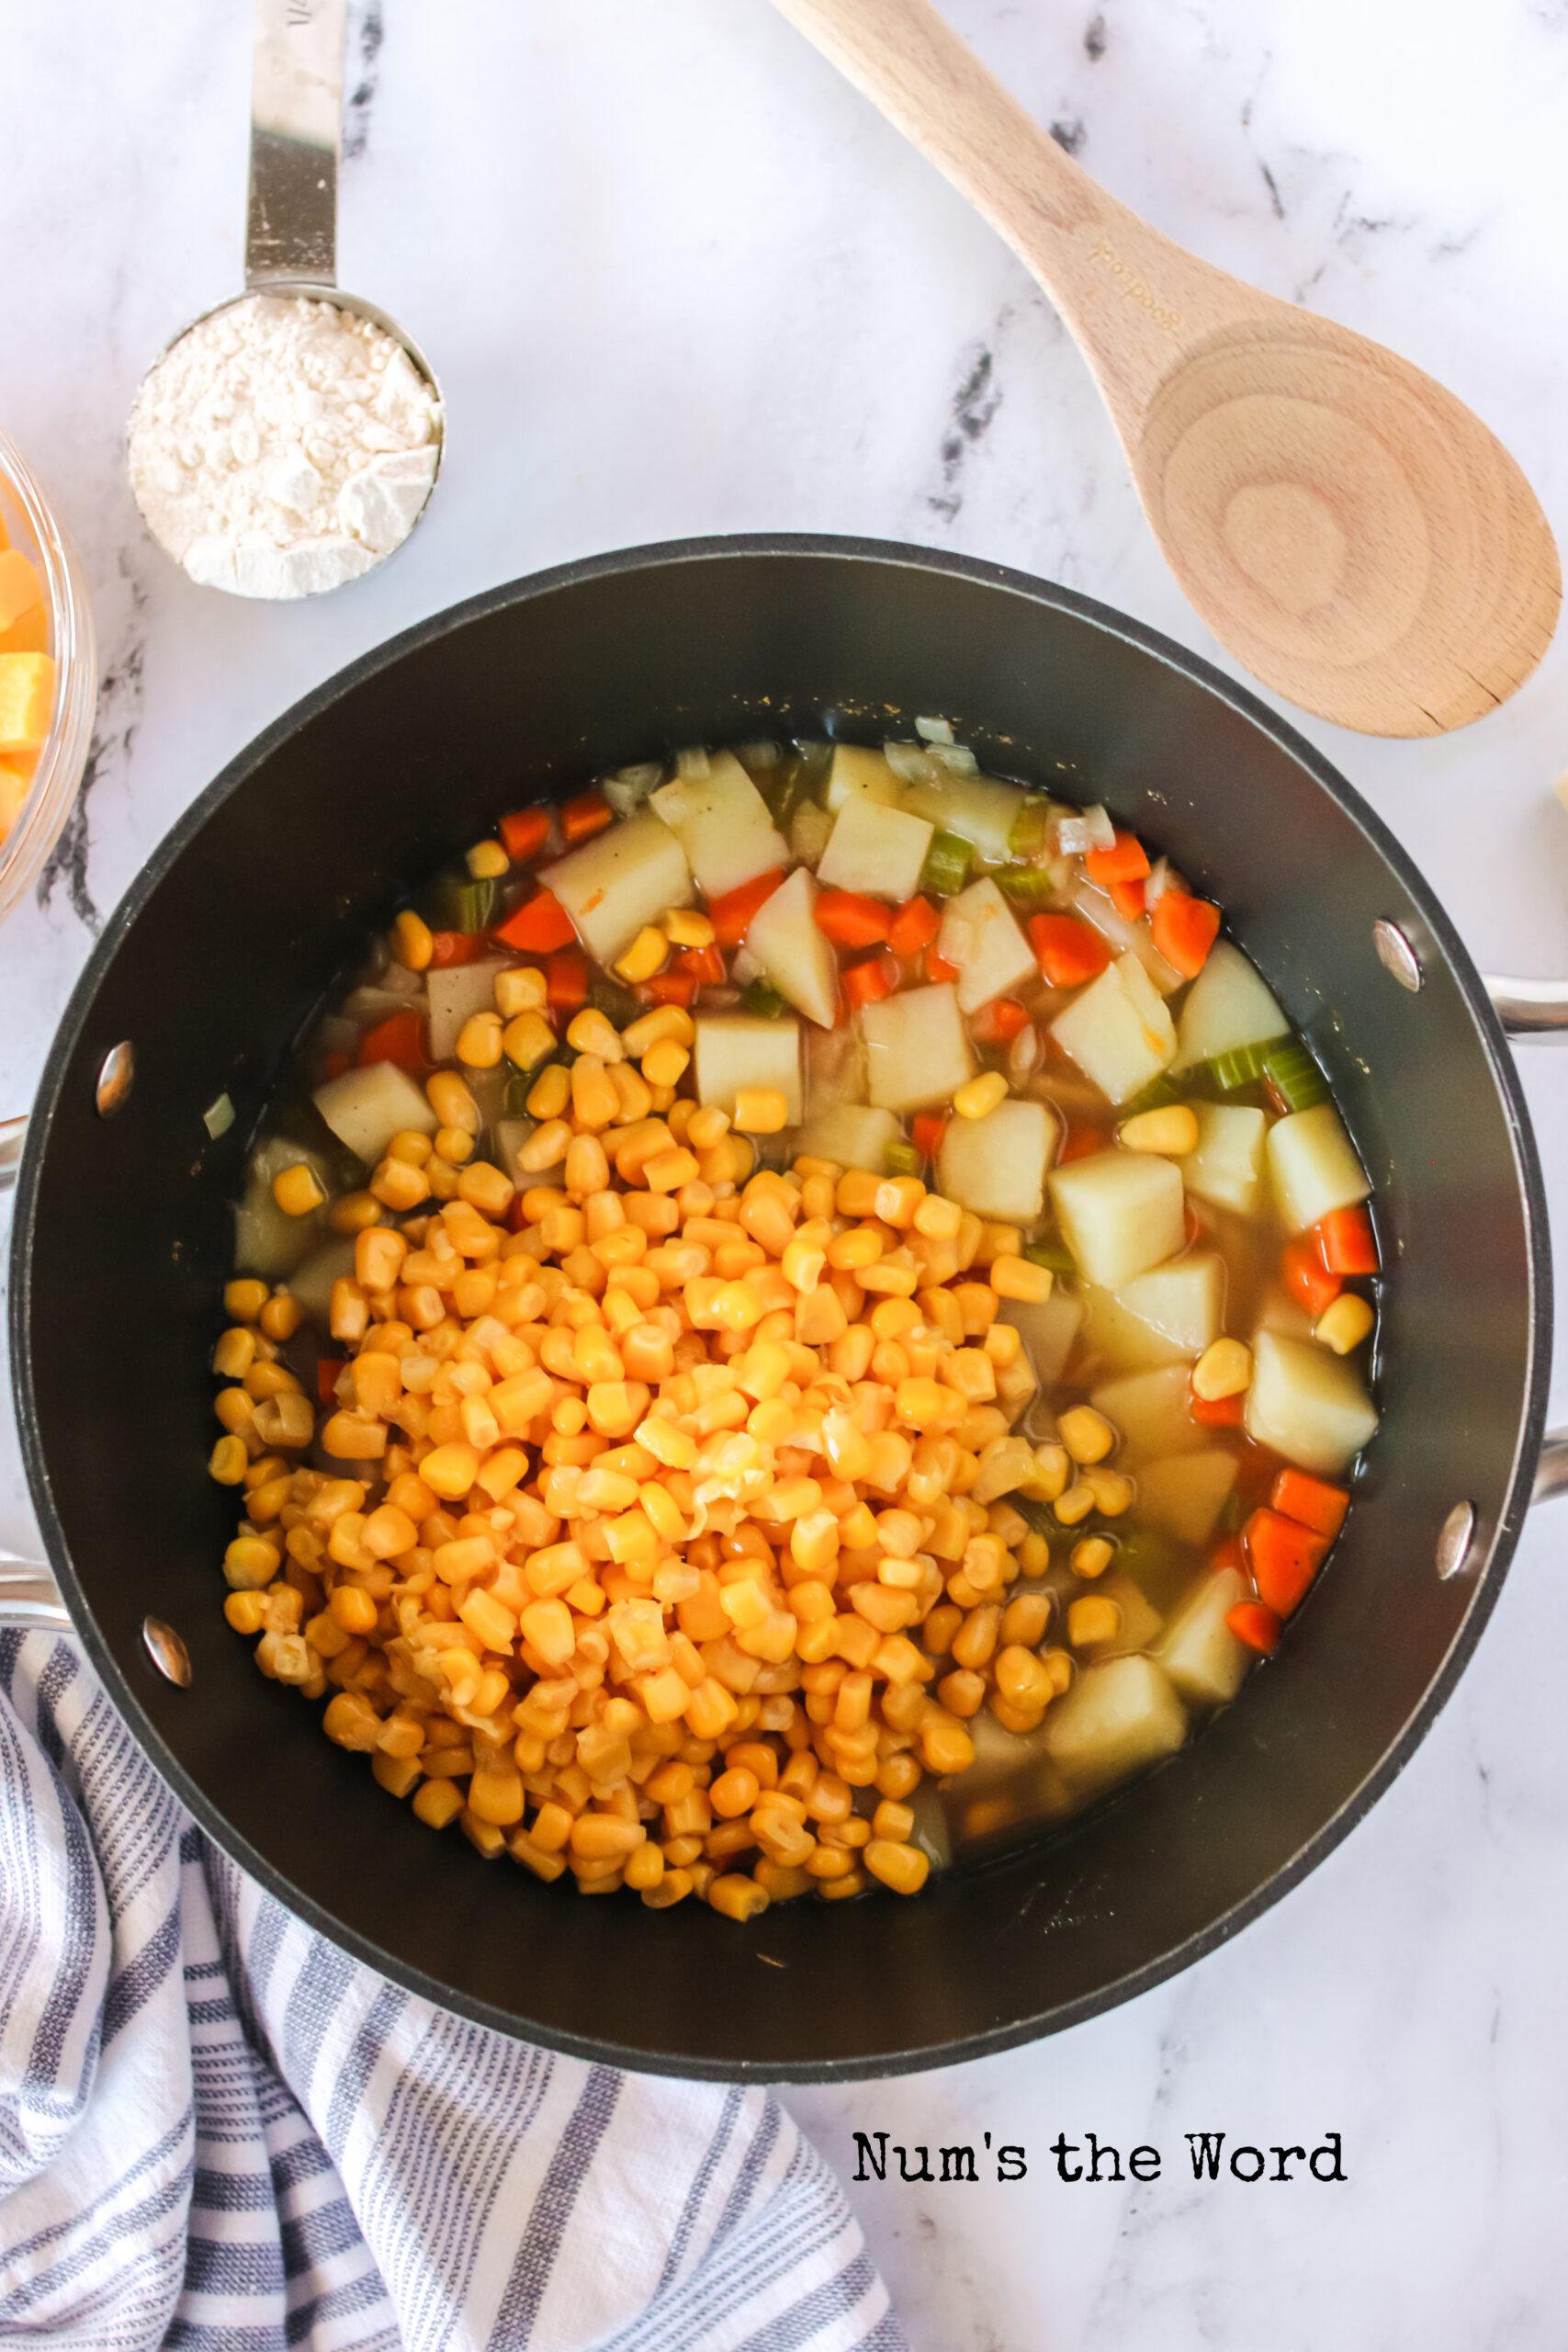 Corn added to potato mix.